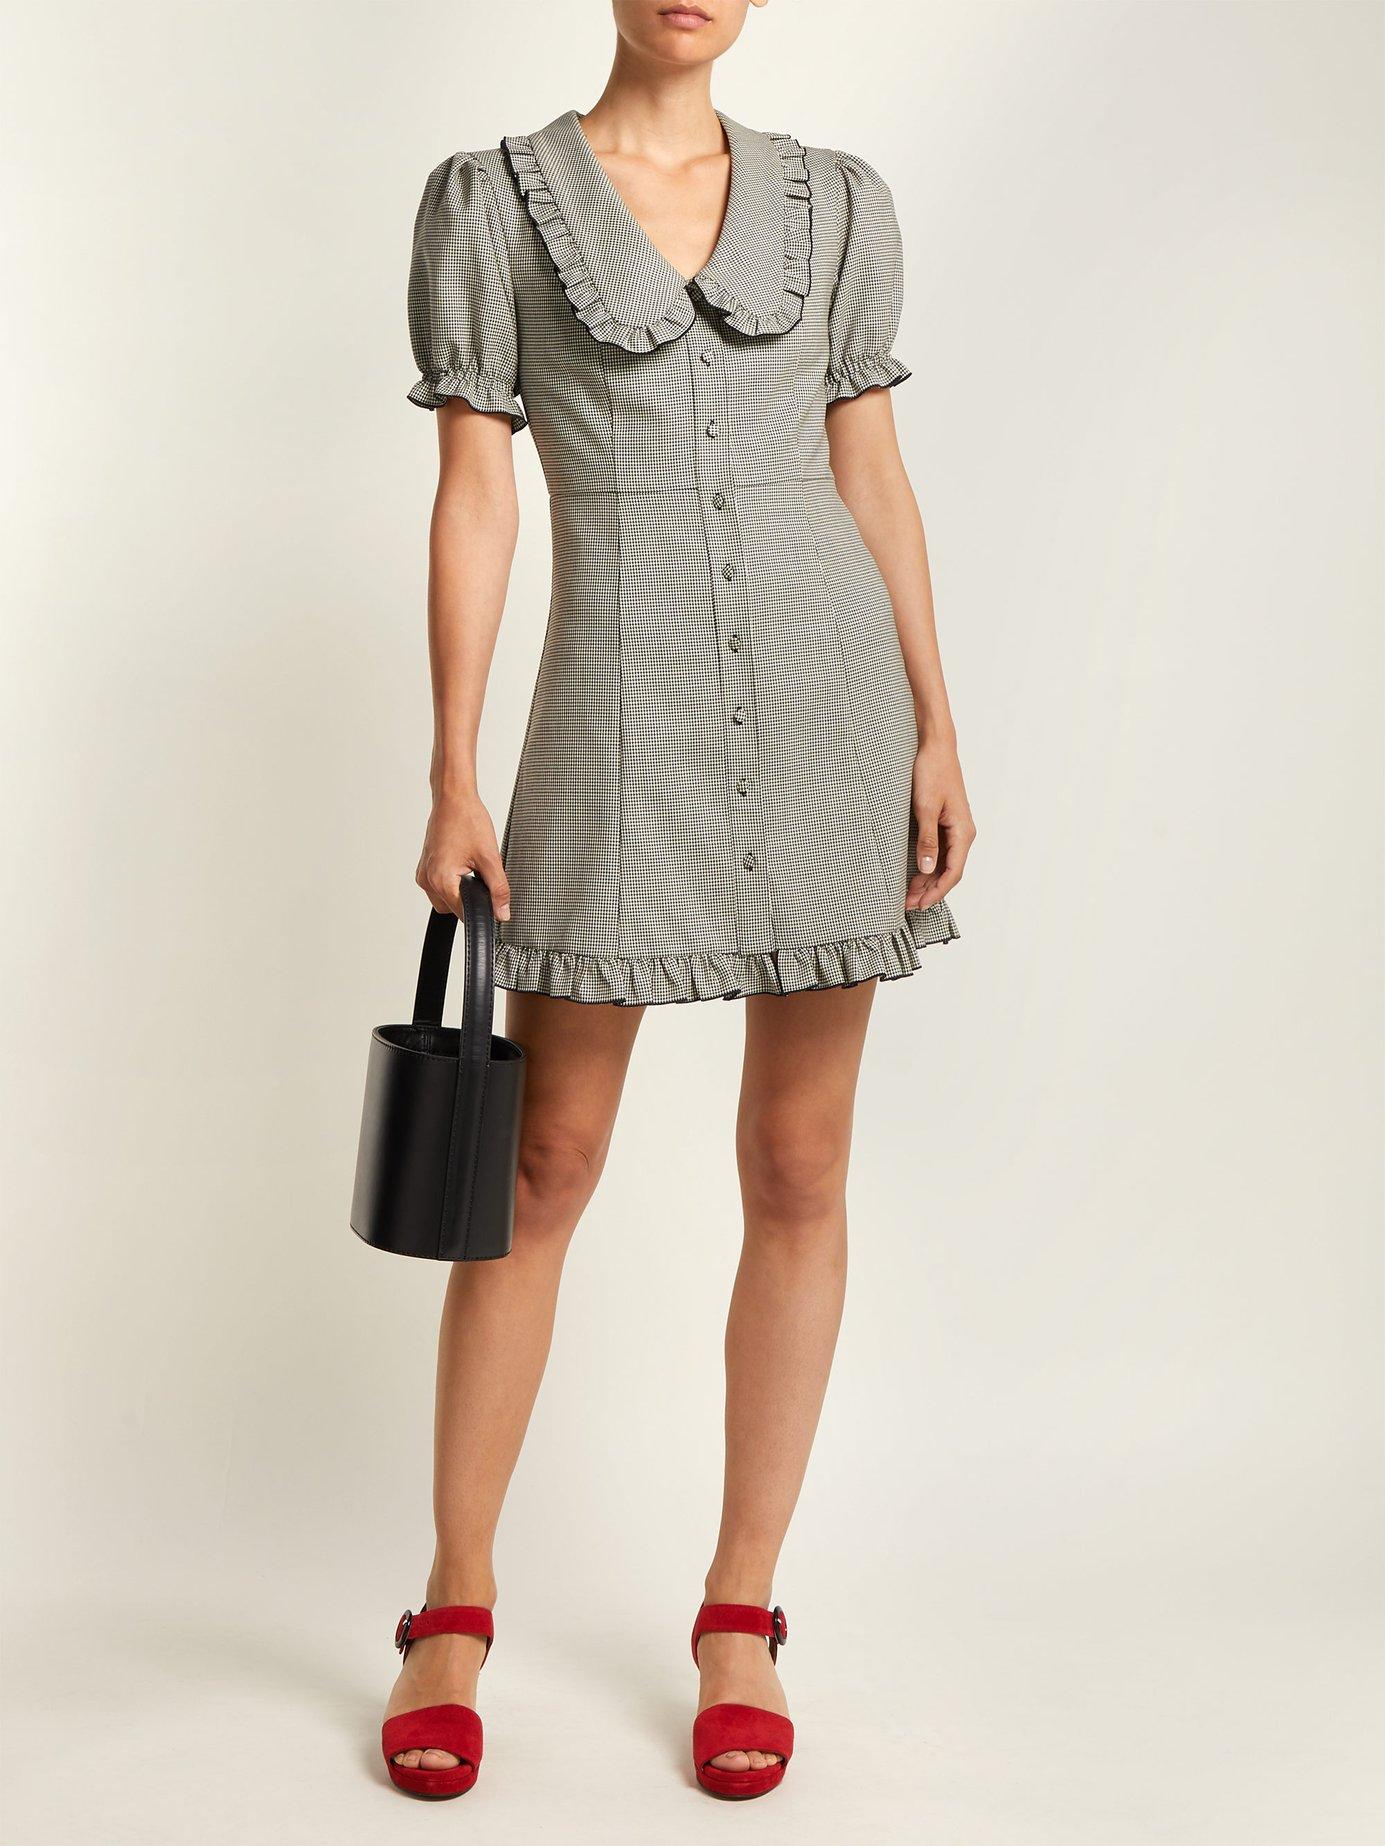 Puritan-collar babydoll dress by Alexachung